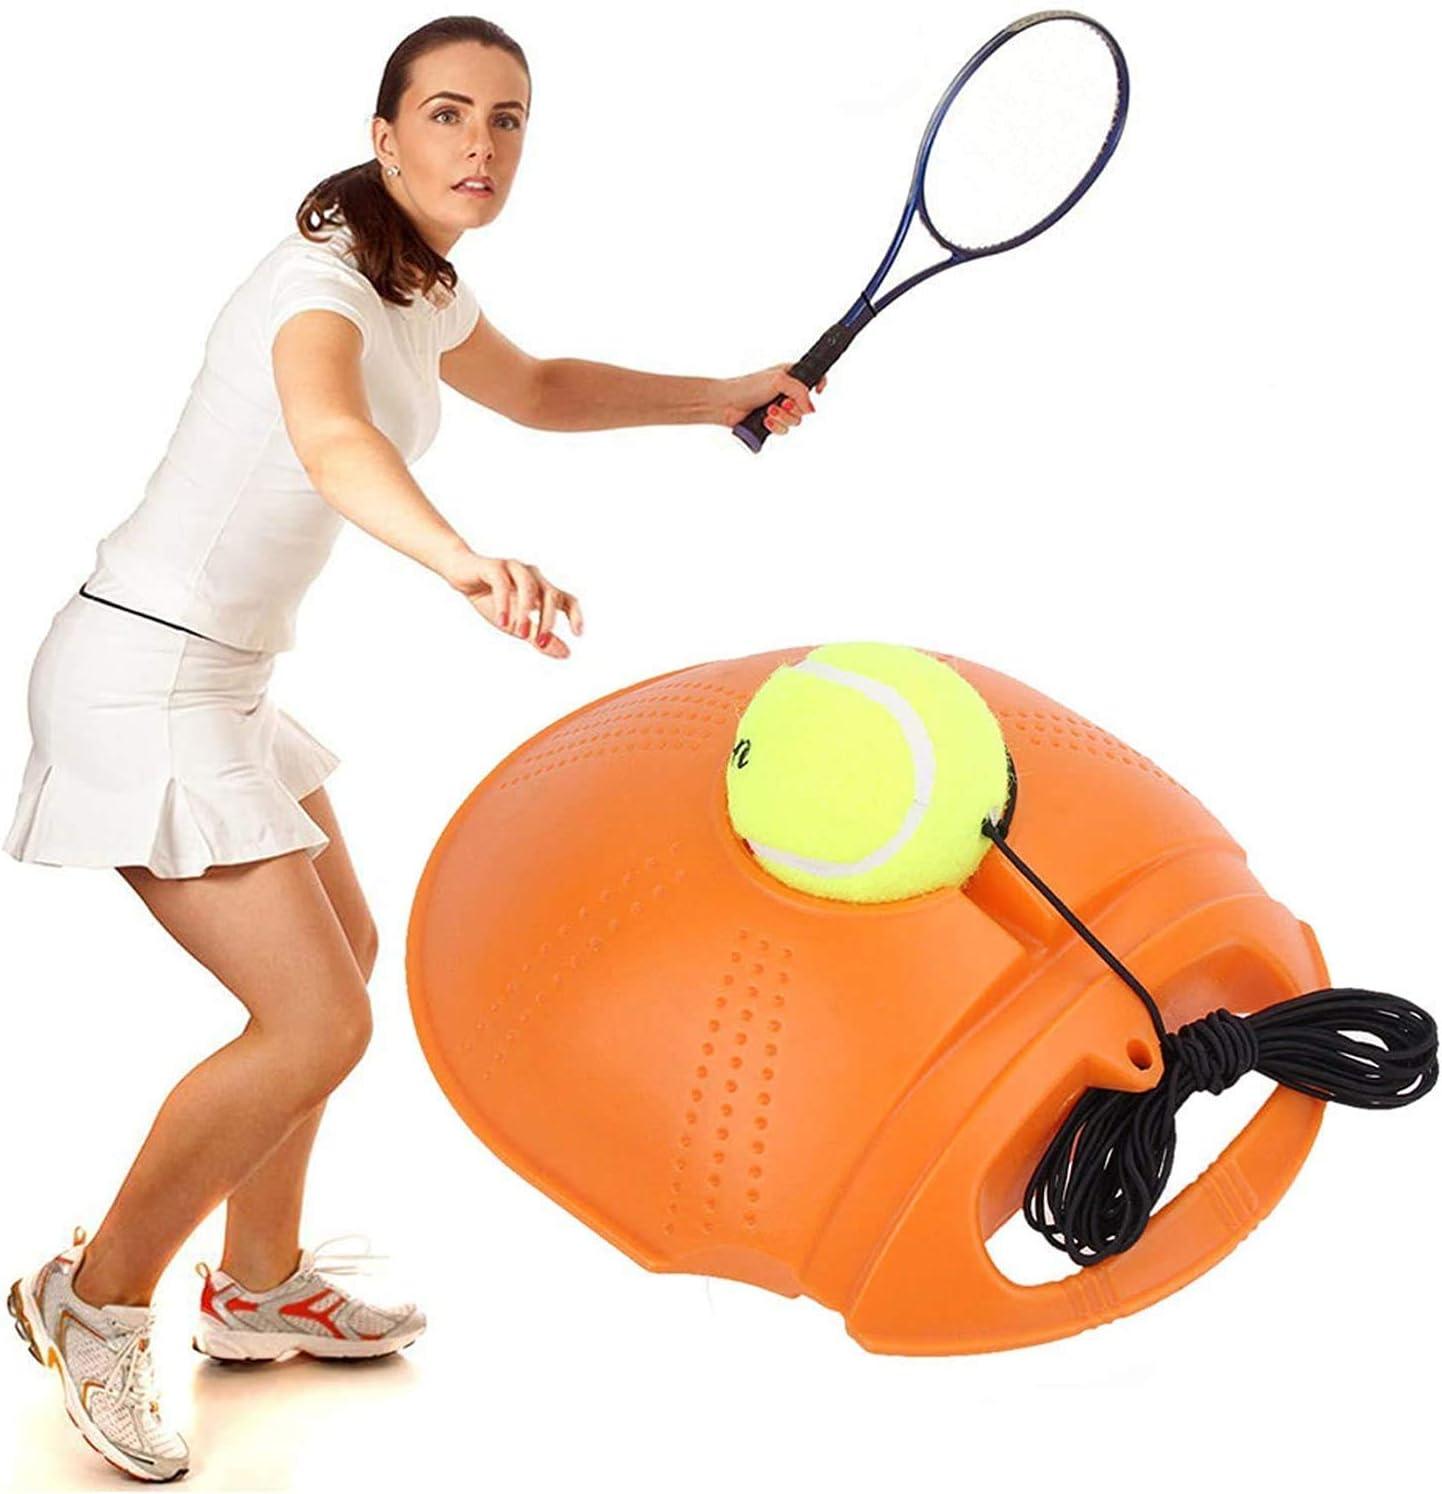 Self Tennis Training Tool Ball Back Training Gear Self Tennis Portable Exercise Baseboard for Beginner COOBNO Tennis Trainer Rebound Ball